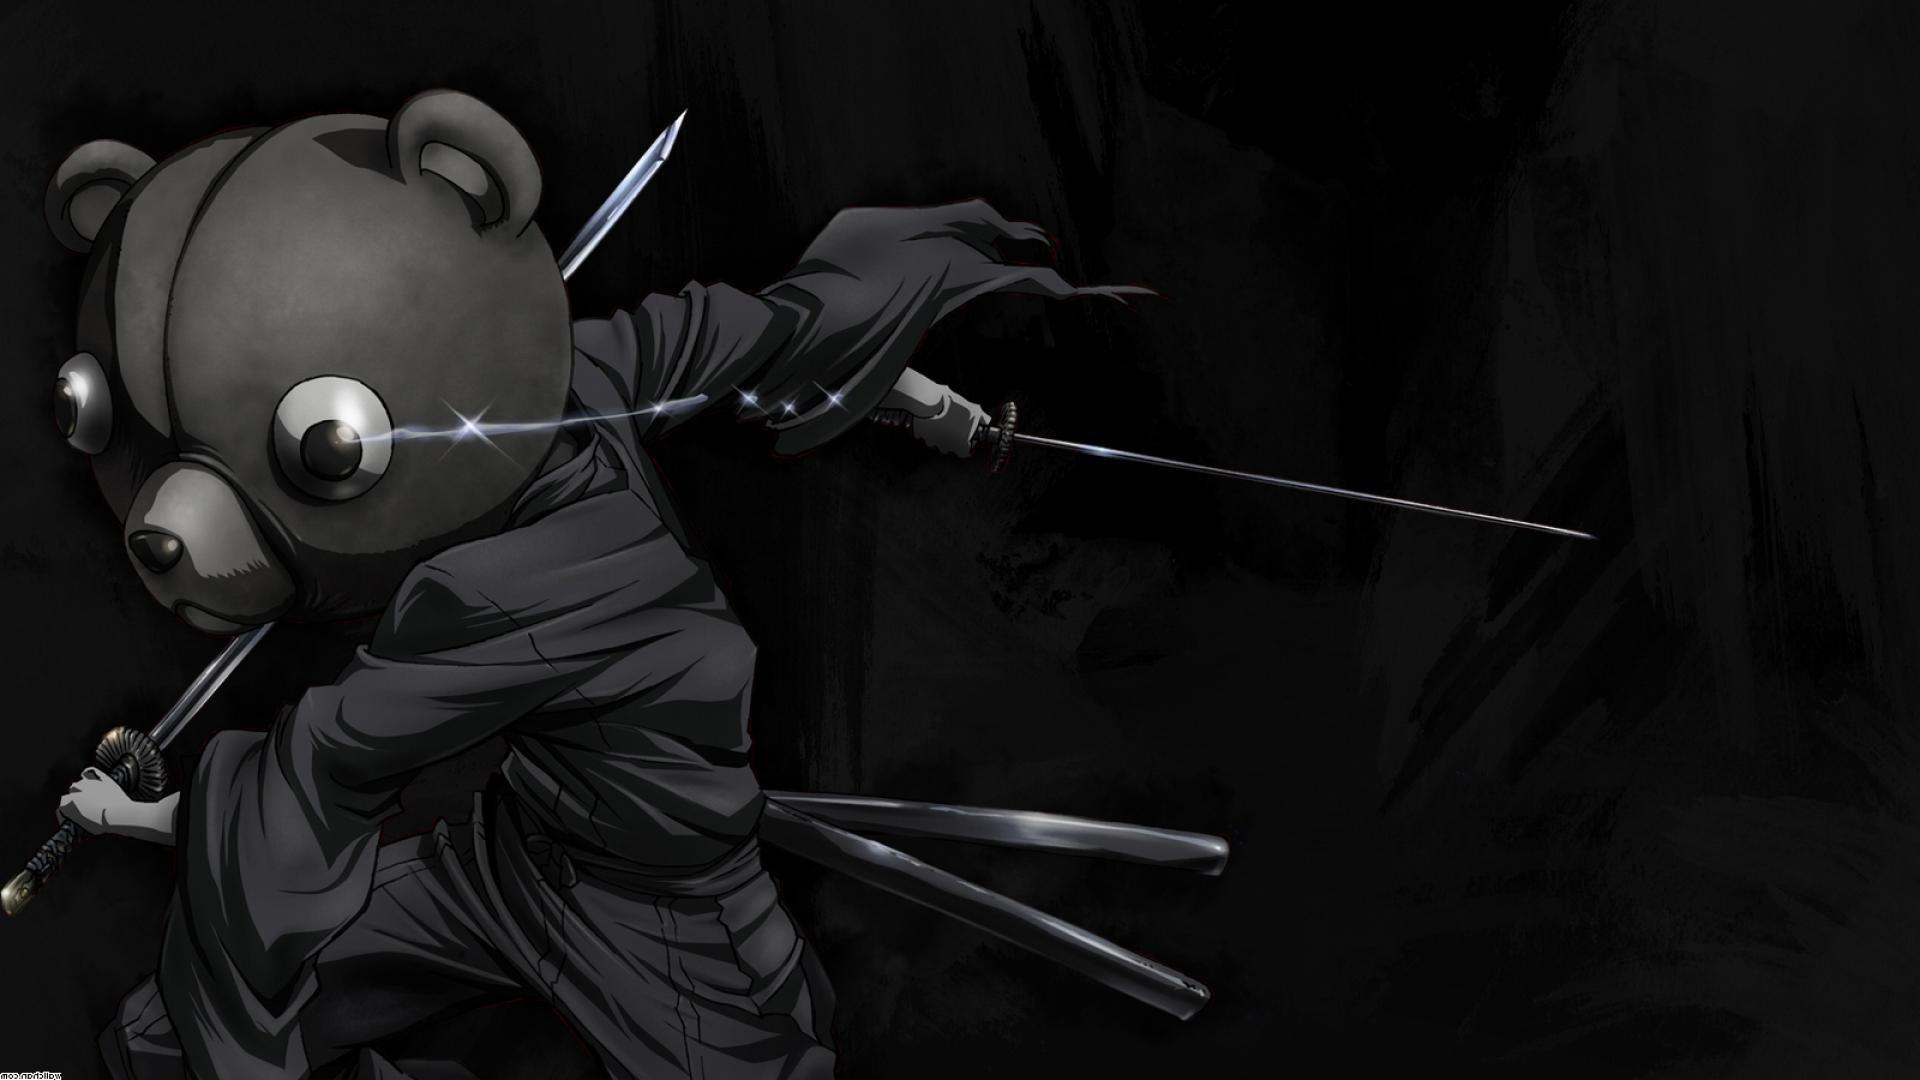 1920x1080 Px Afro Samurai Jinno